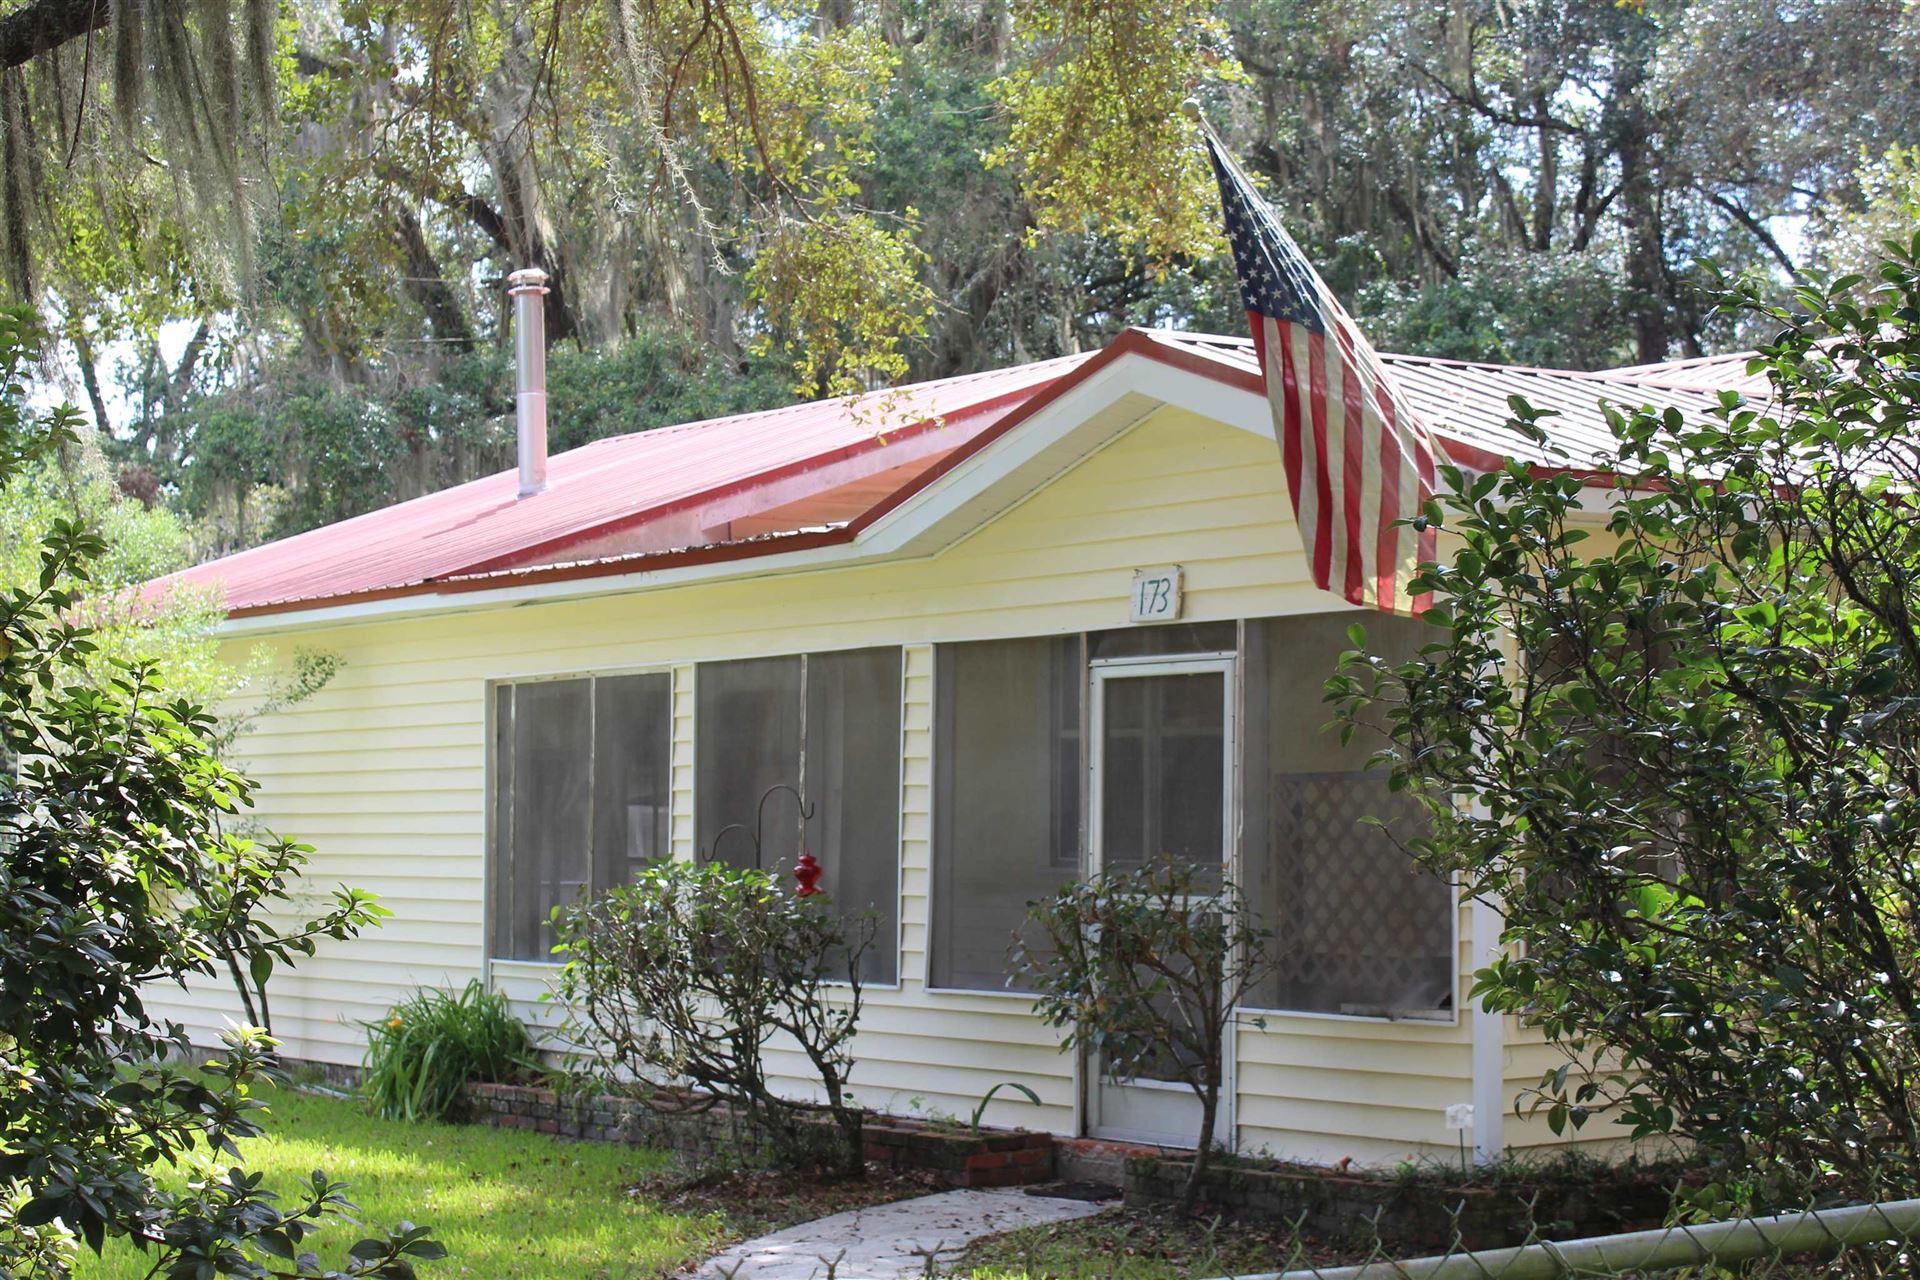 173 E WOODS Street, Perry, FL 32348 - MLS#: 337438